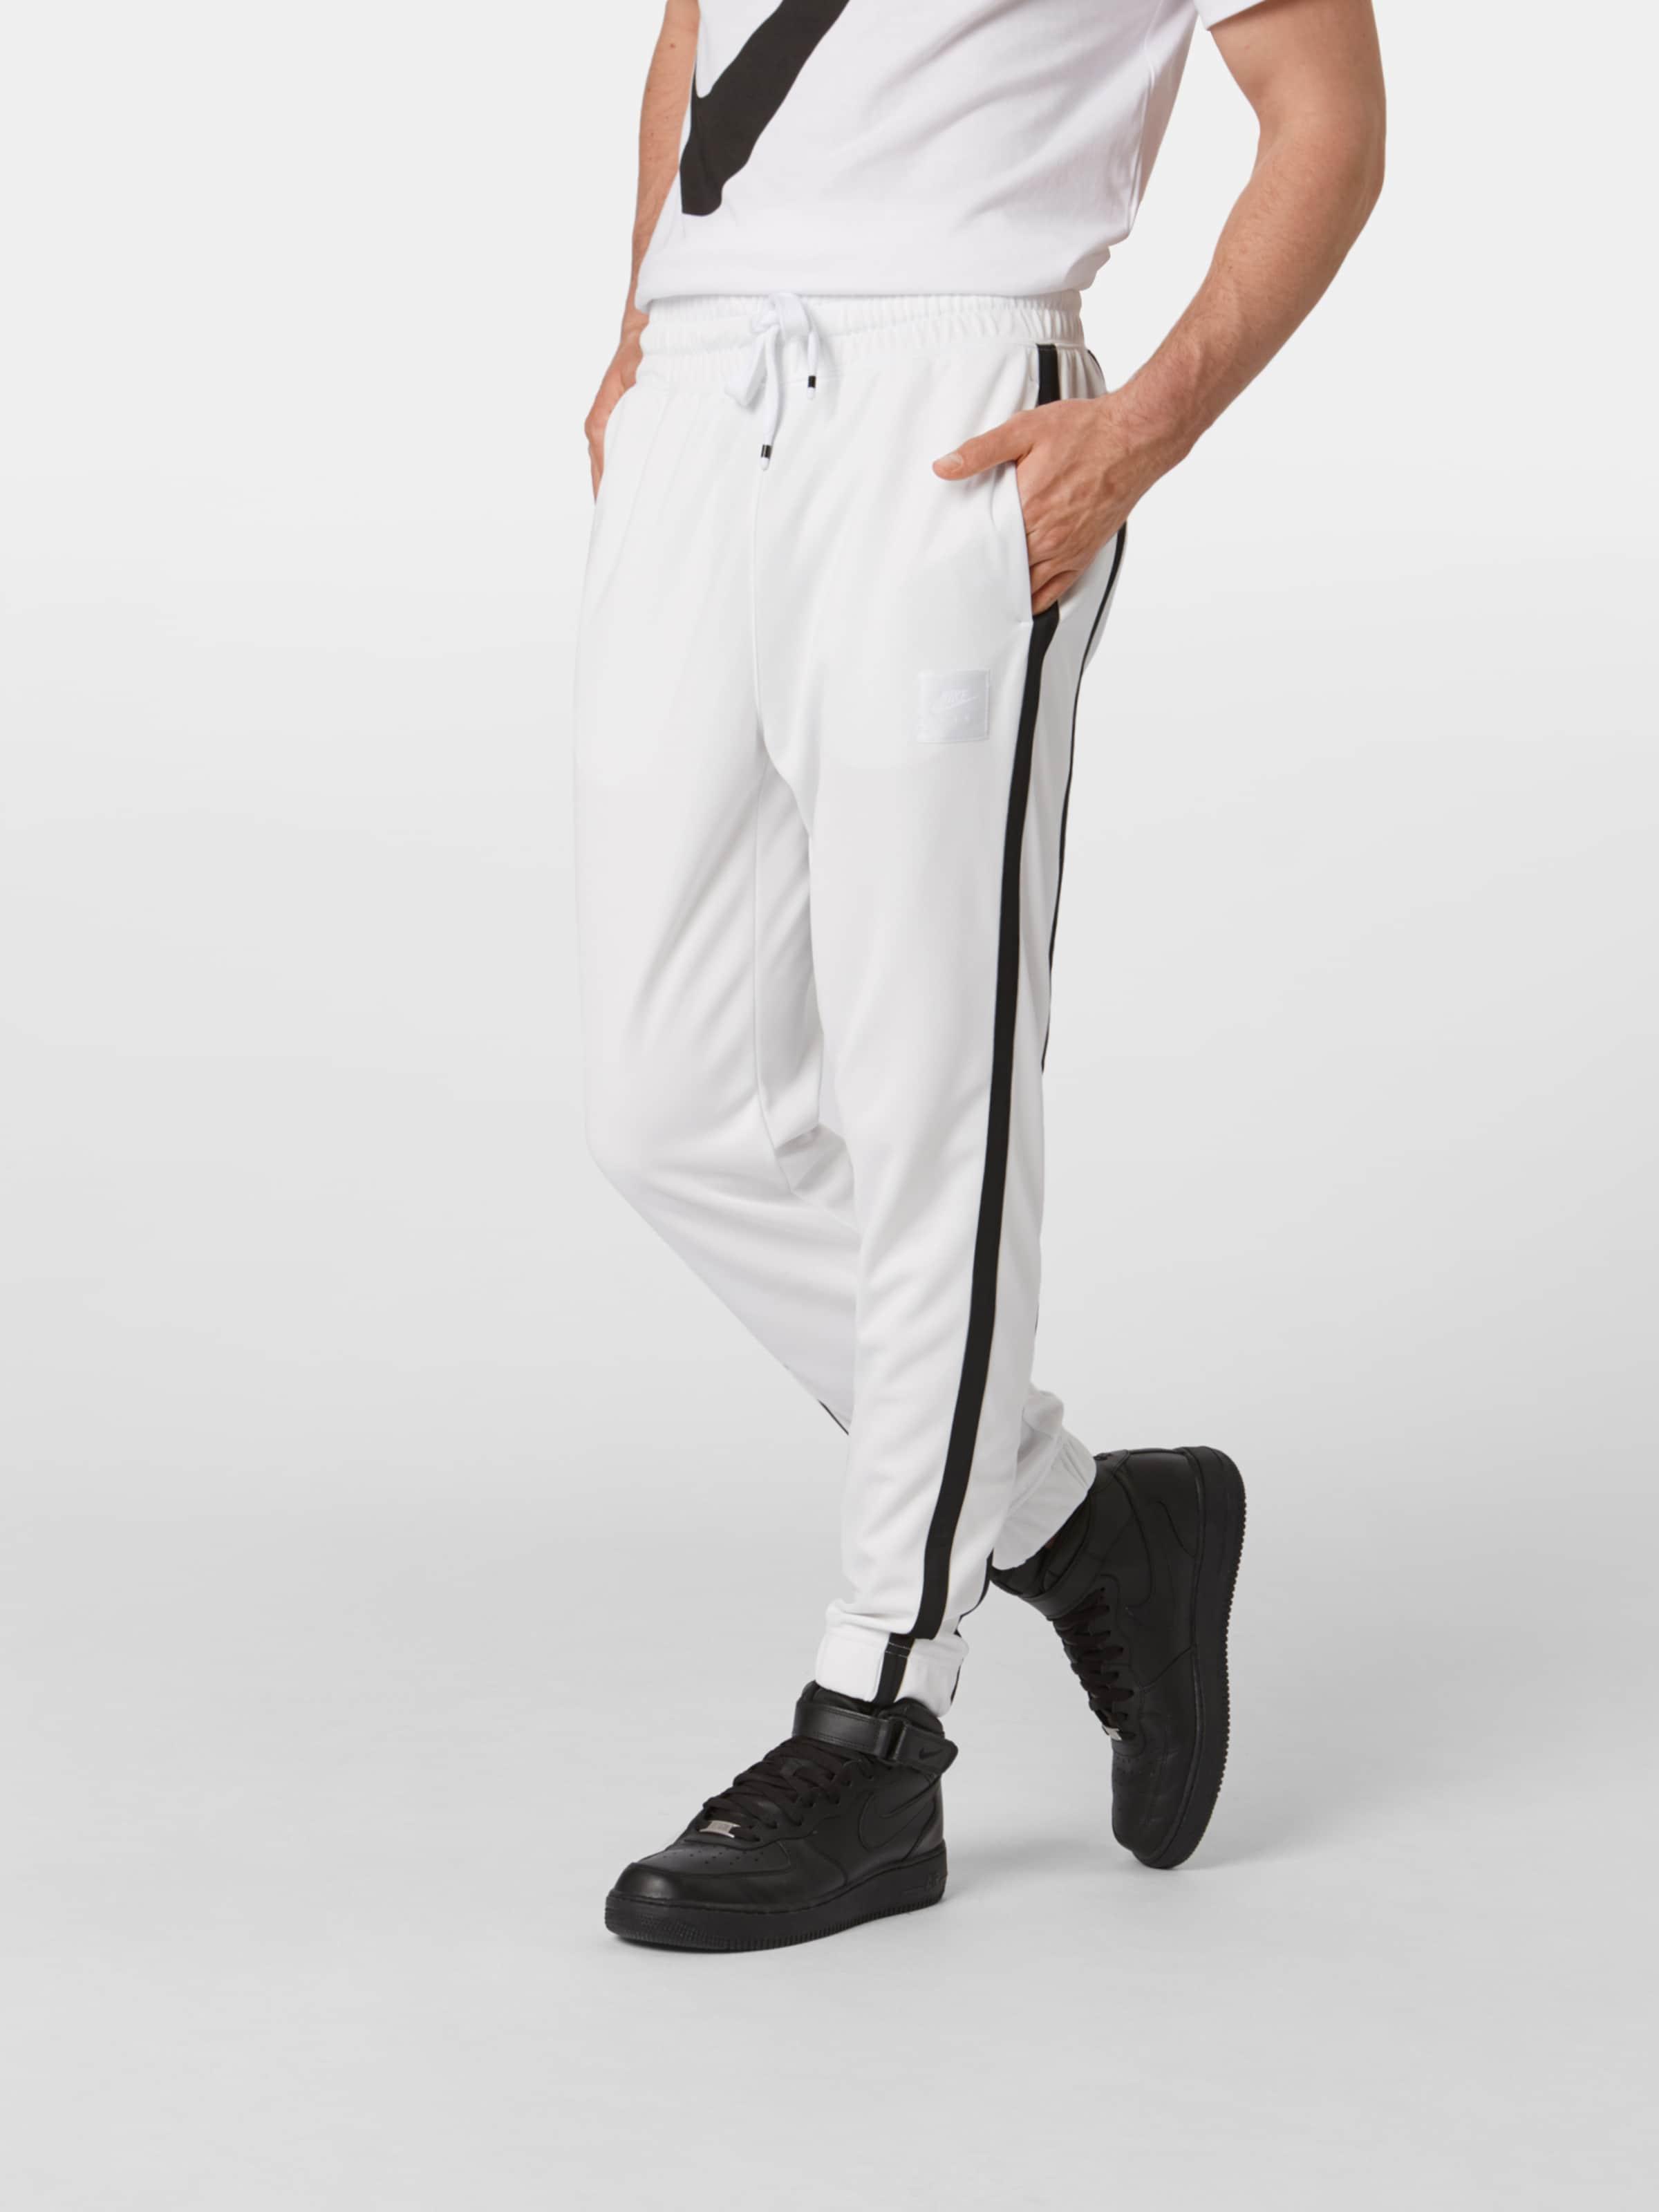 Pantalon Sportswear 'air' NoirBlanc En Nike 6gvyYfI7b